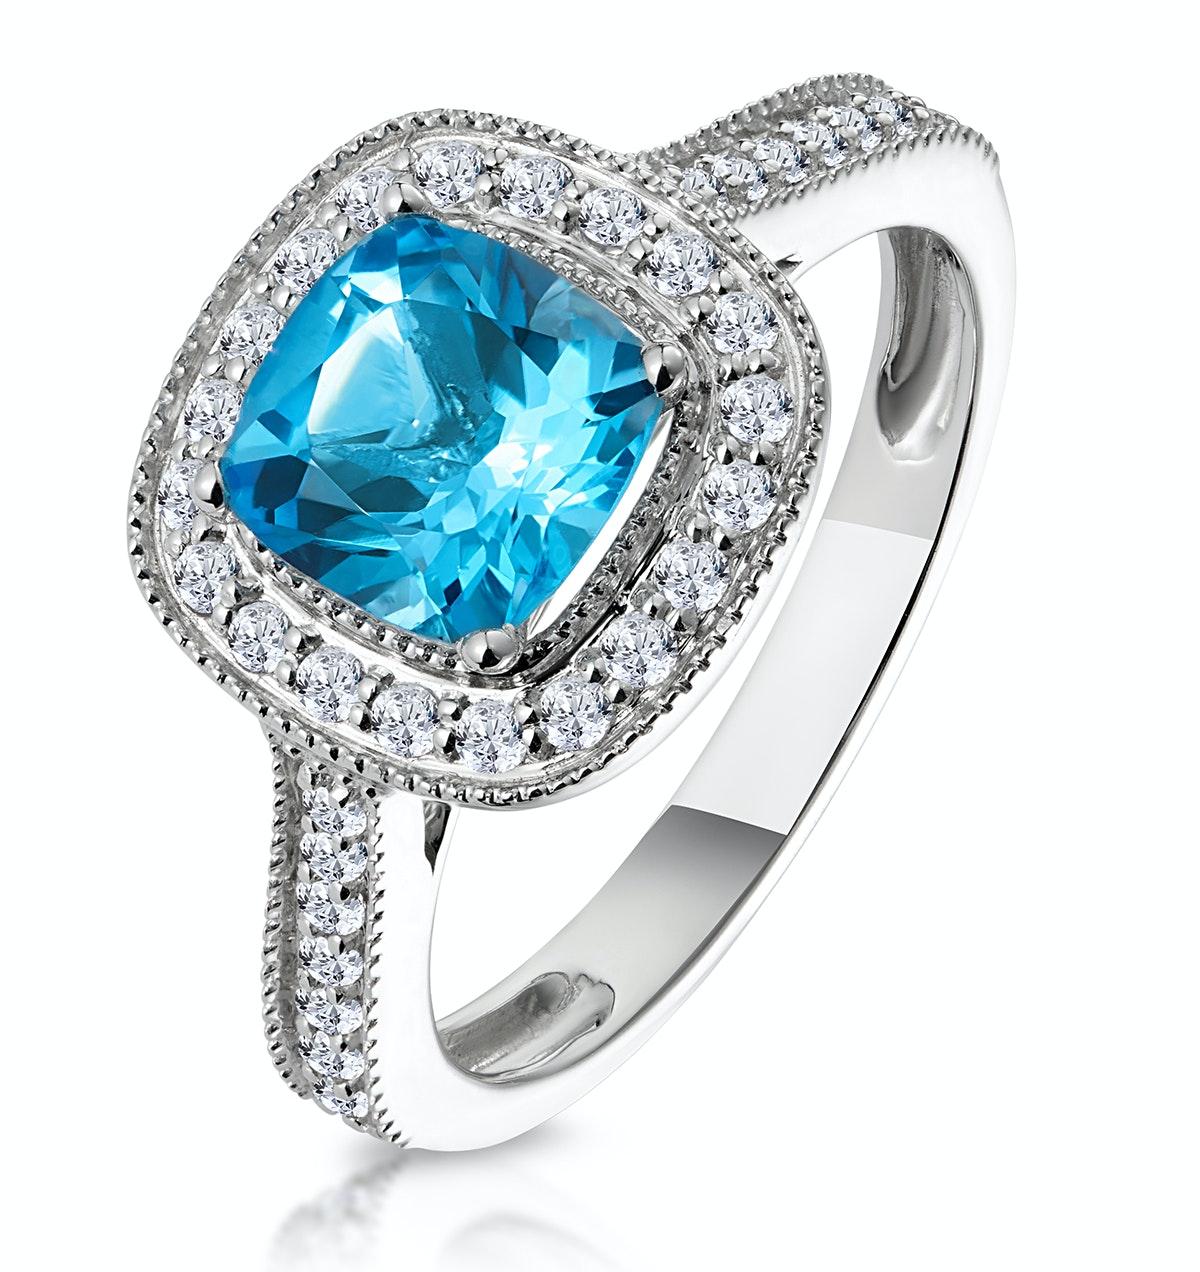 2.50ct Cushion Blue Topaz Diamond Halo Asteria Ring in 18K White Gold